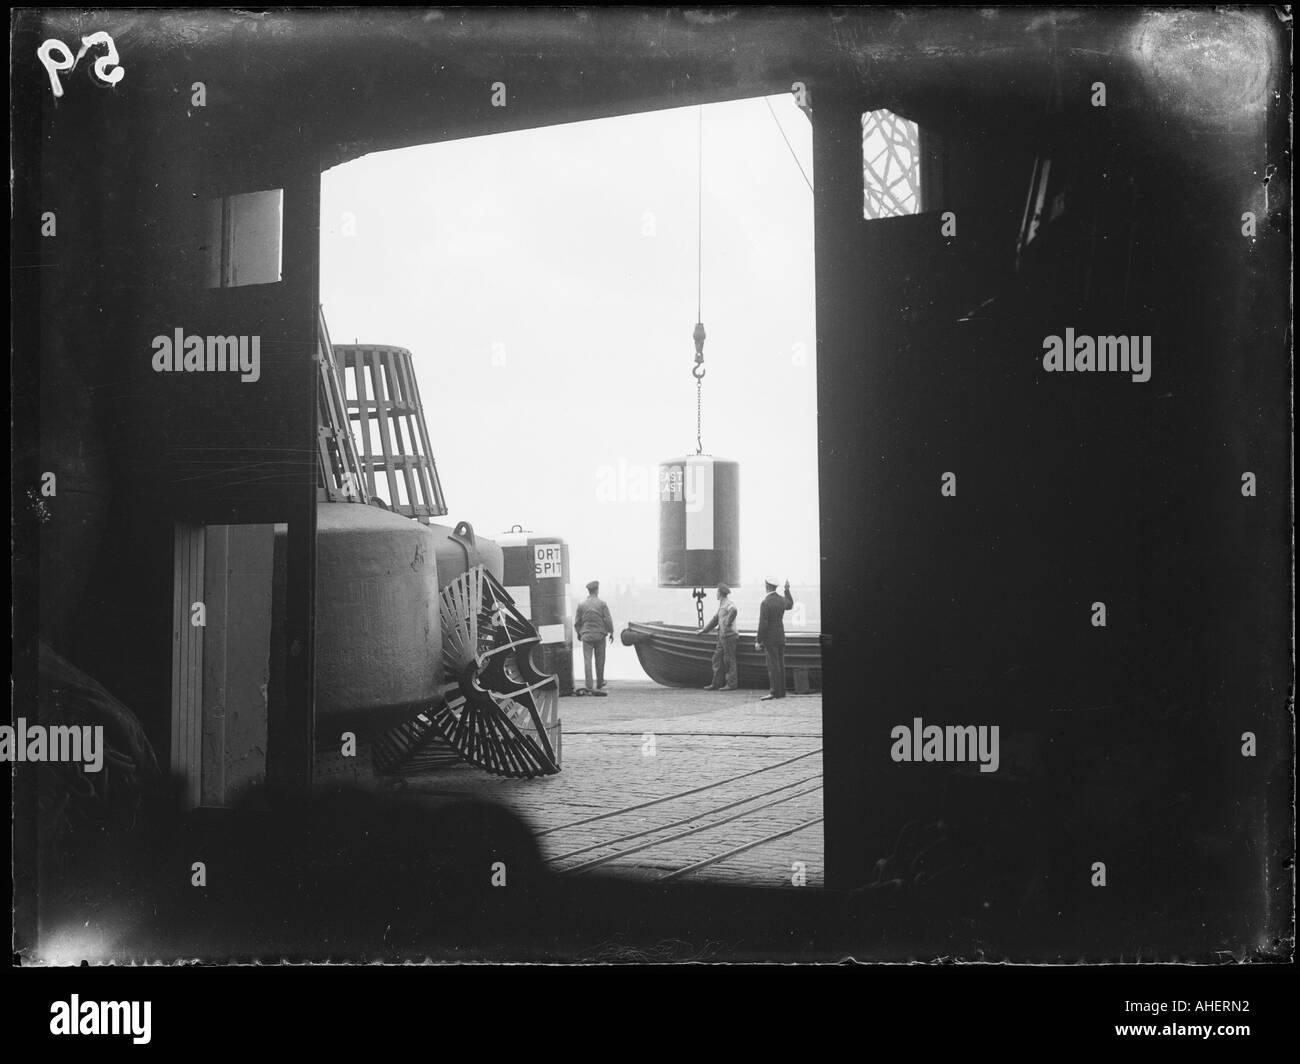 Life Buoys On Shore - Stock Image